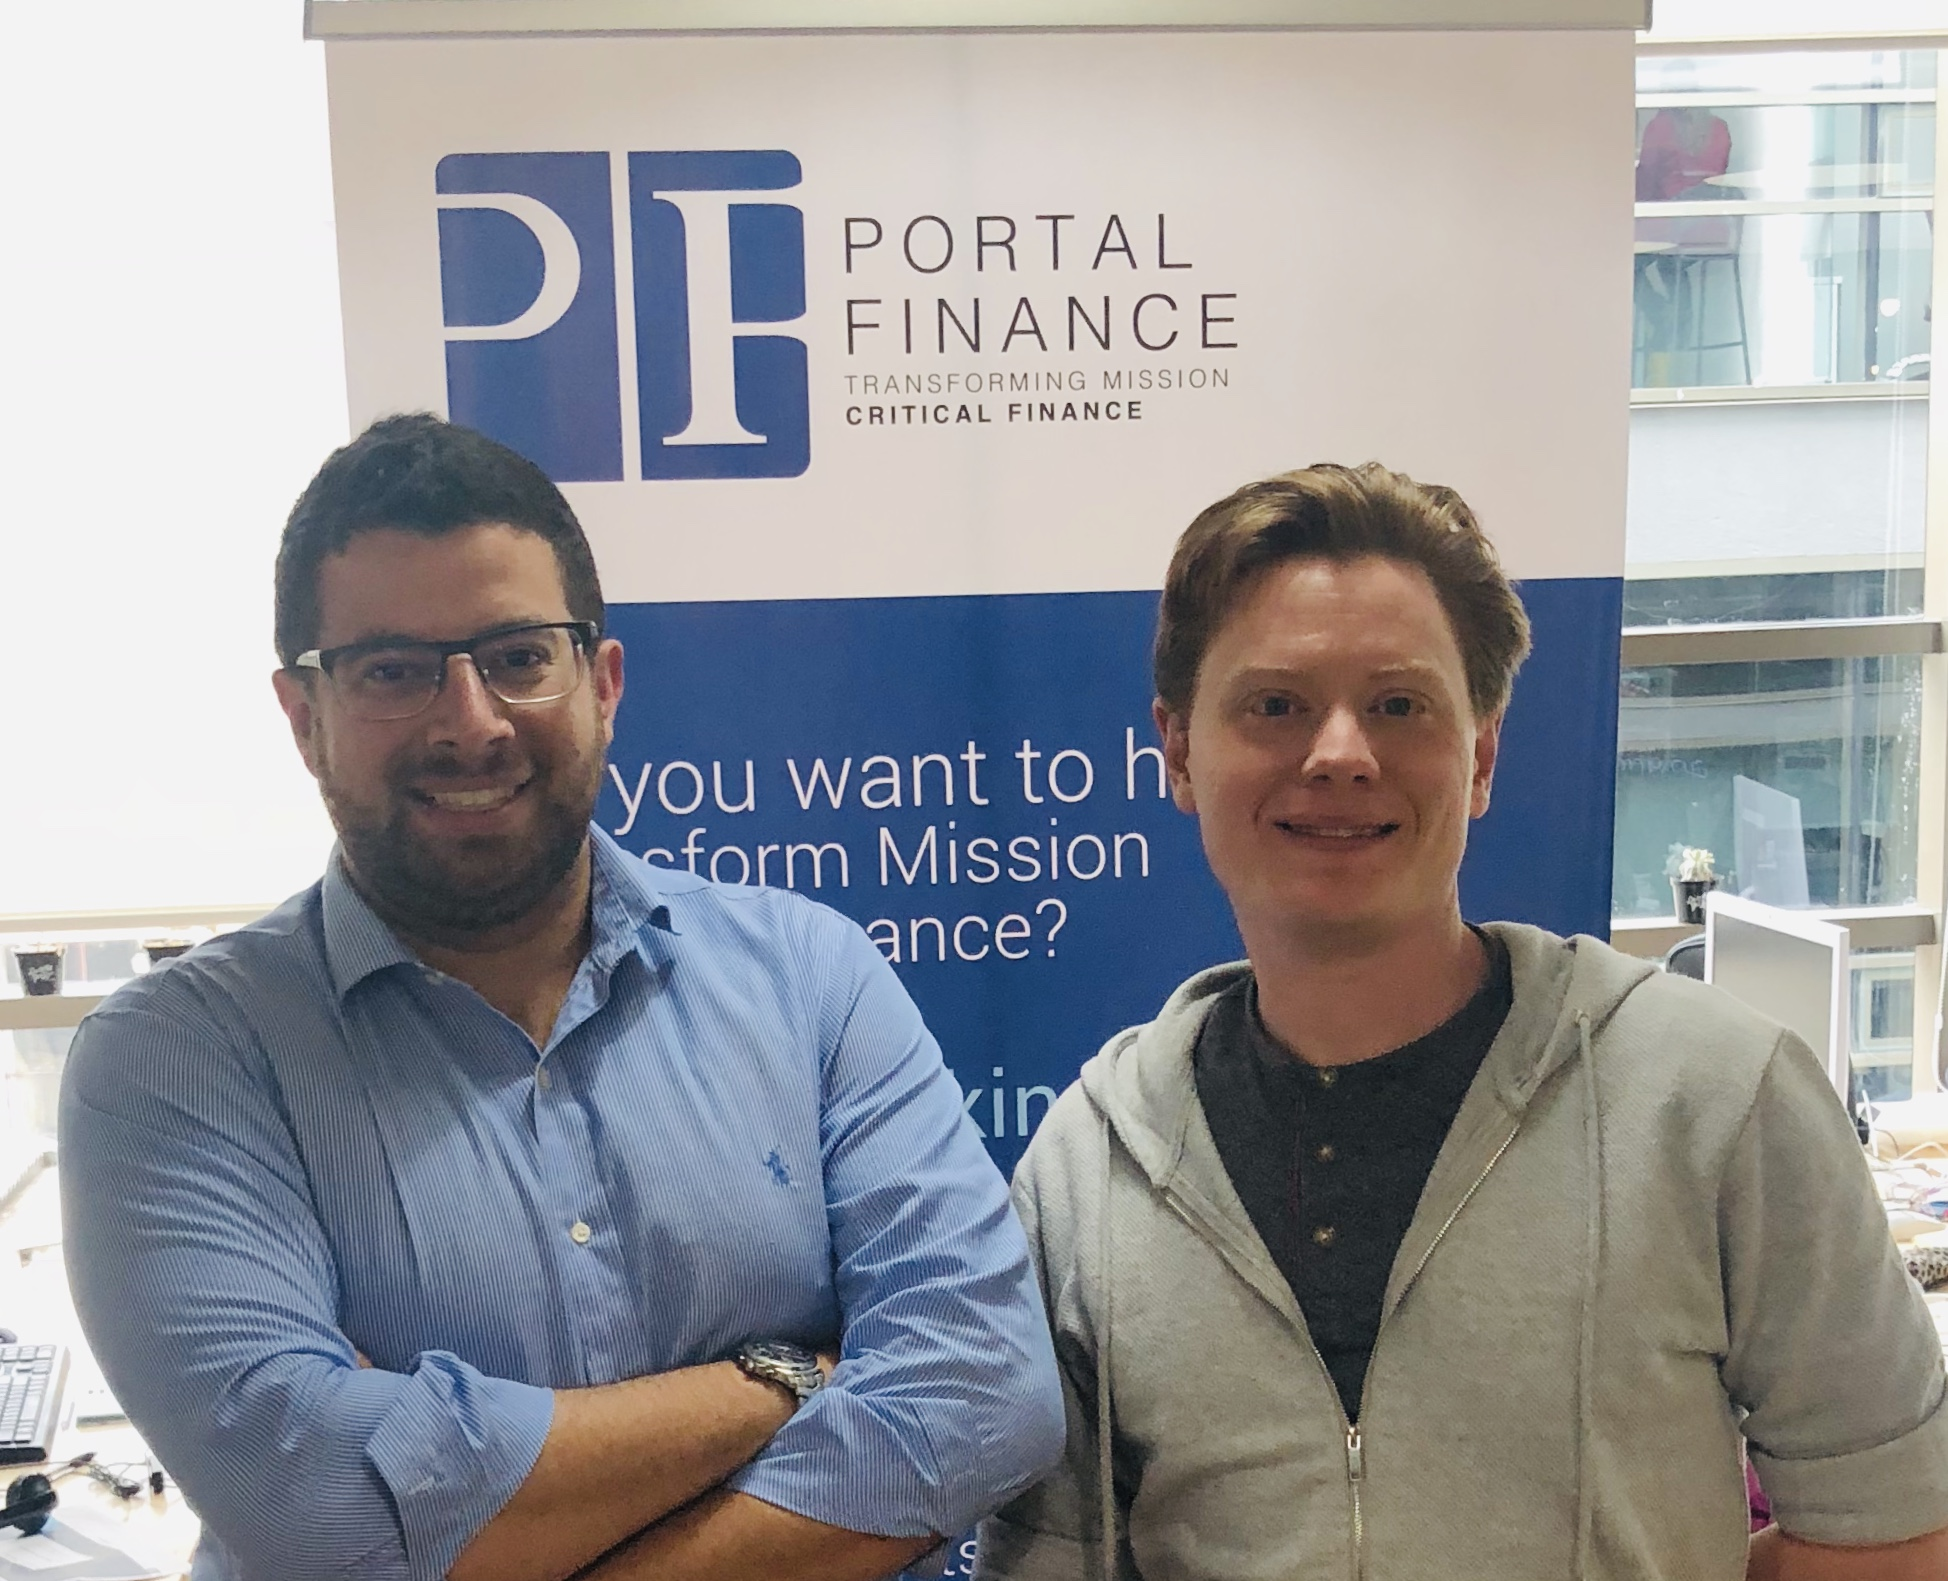 Lending startup Portal Finance nabs 0 million for small business loans in Latin America